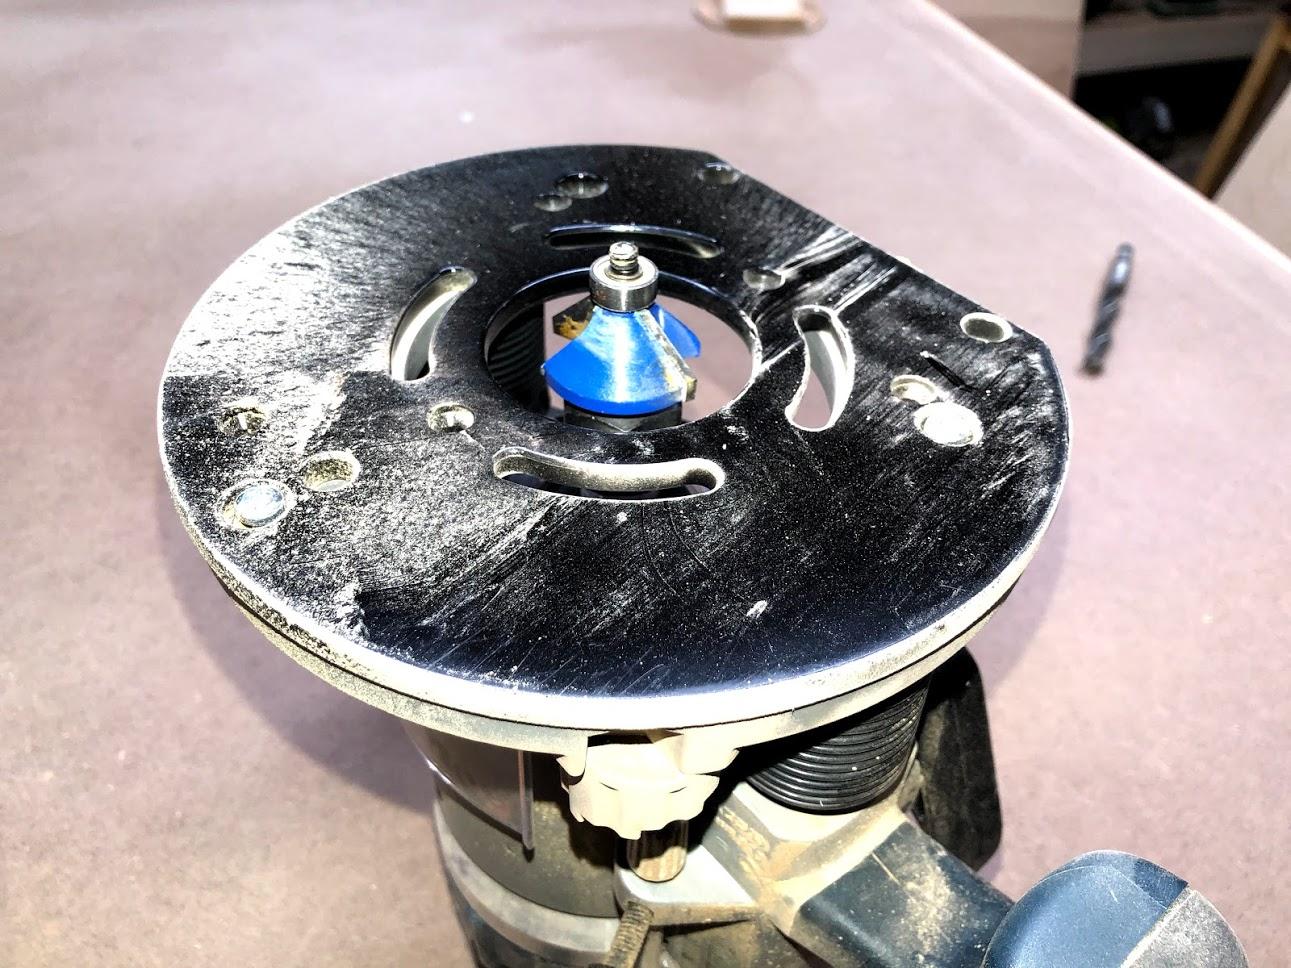 Here is the chamfer bit I used on the slid oak trim